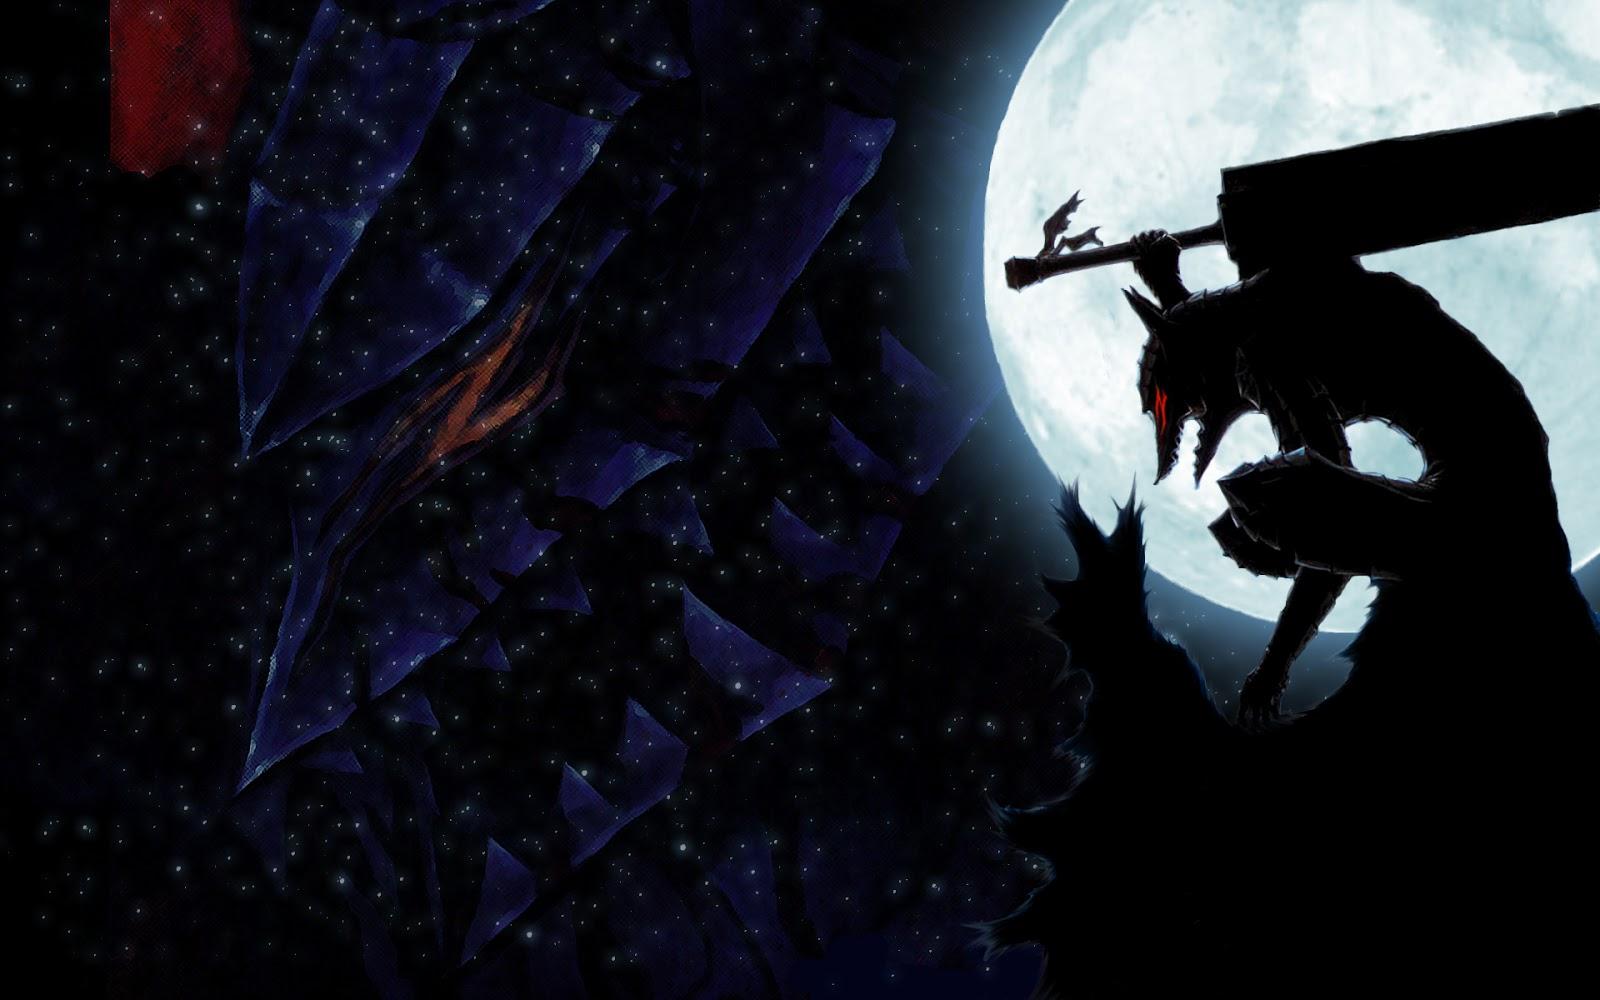 Anime Wallpapers Berserk   Anime Wallpaper 1600x1000